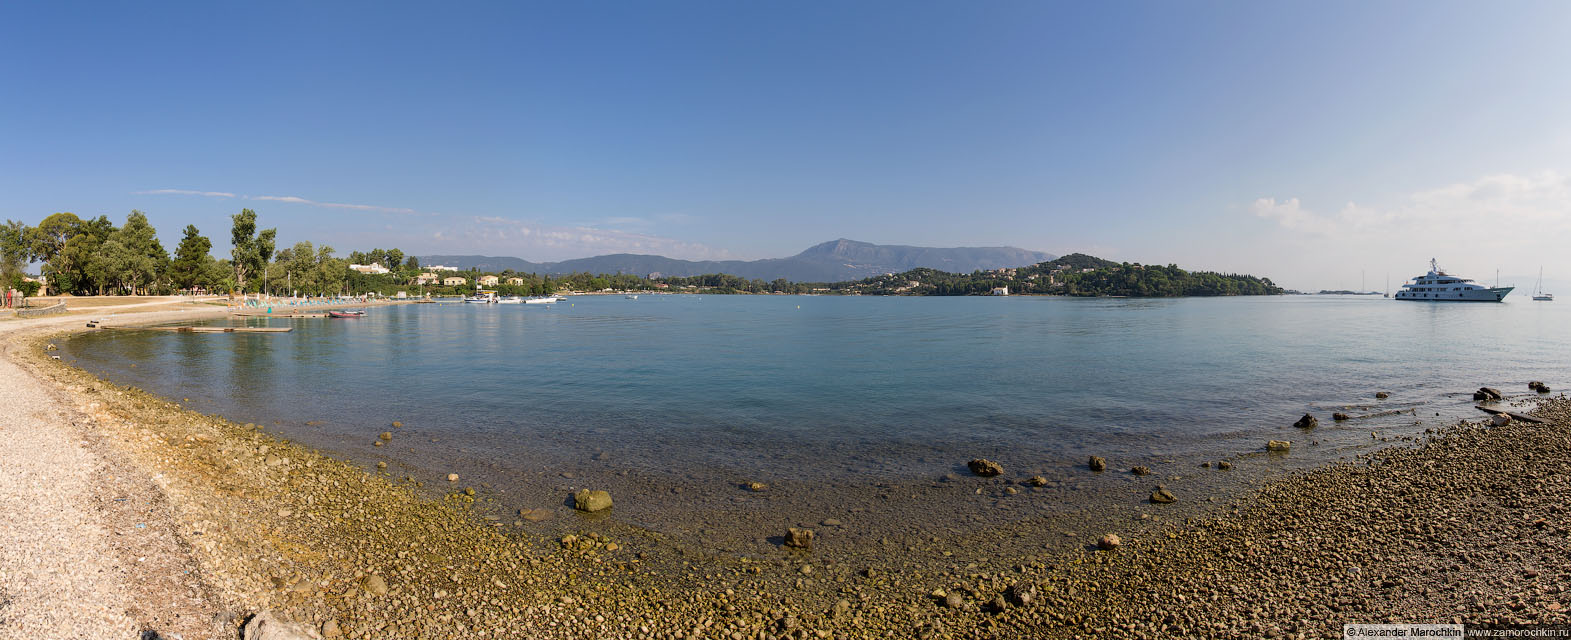 Гувия, Корфу. Панорама северной части бухты